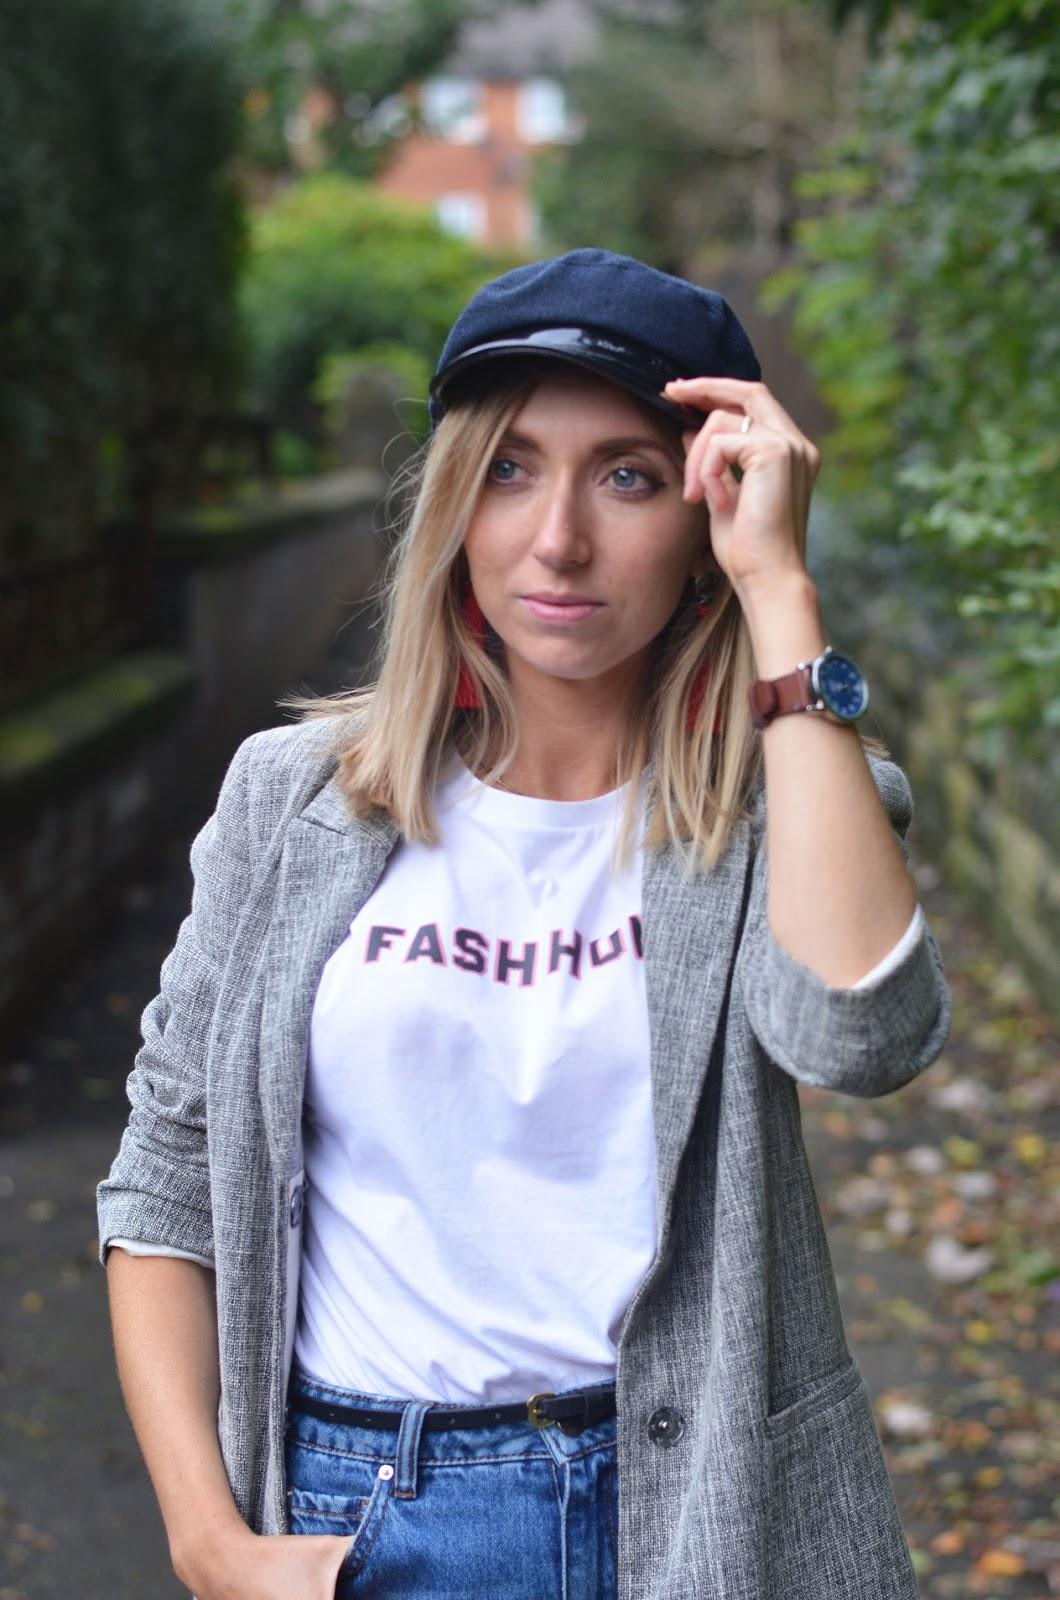 Fash Hun T-shirt from Rock On Ruby